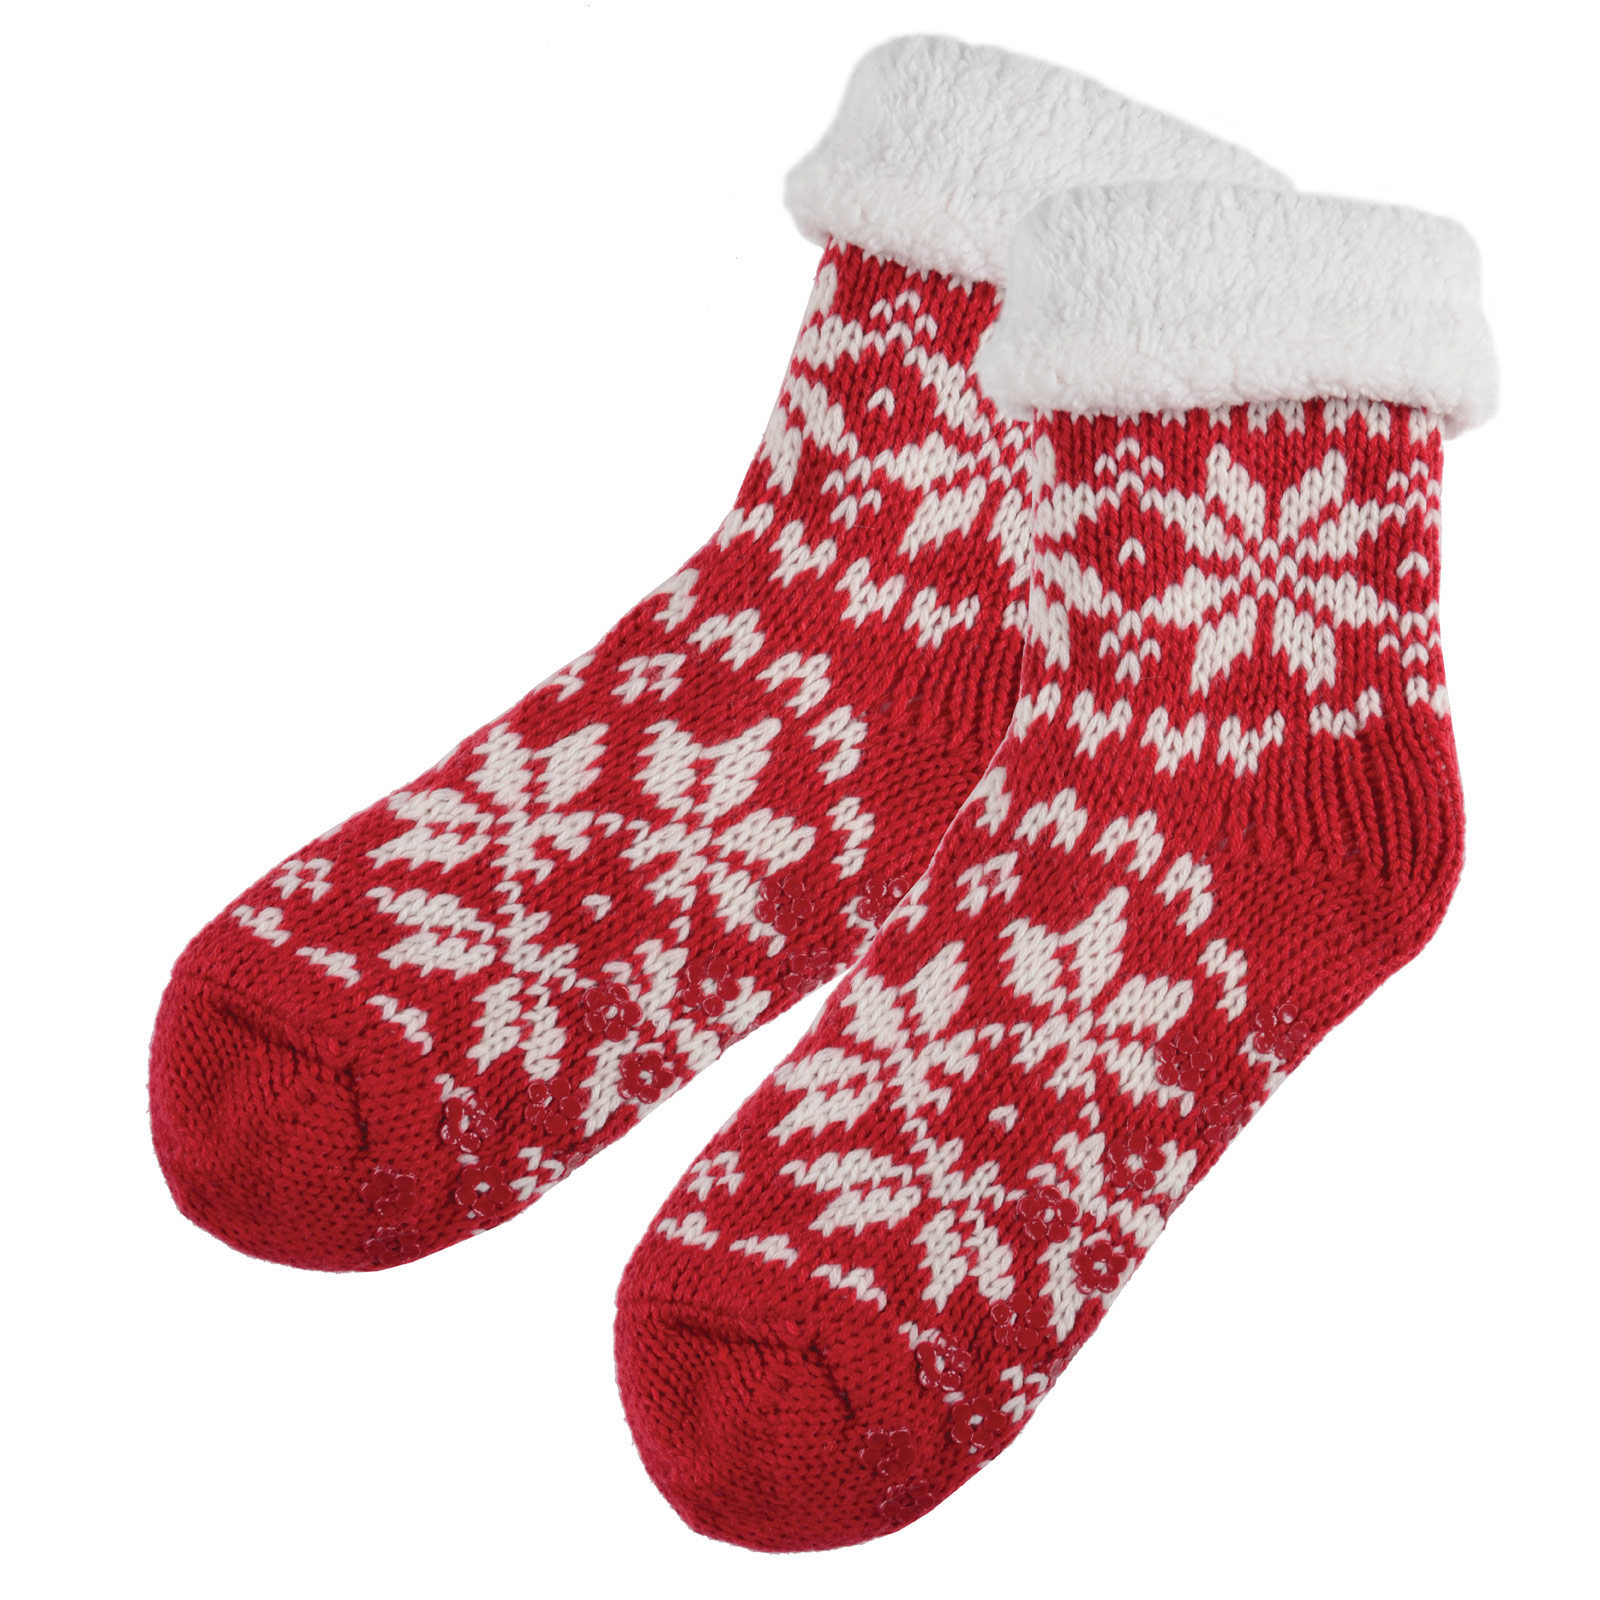 Fleece Fairisle Knit Slipper Socks And Non-Slip Grips Winter Warmers One Size